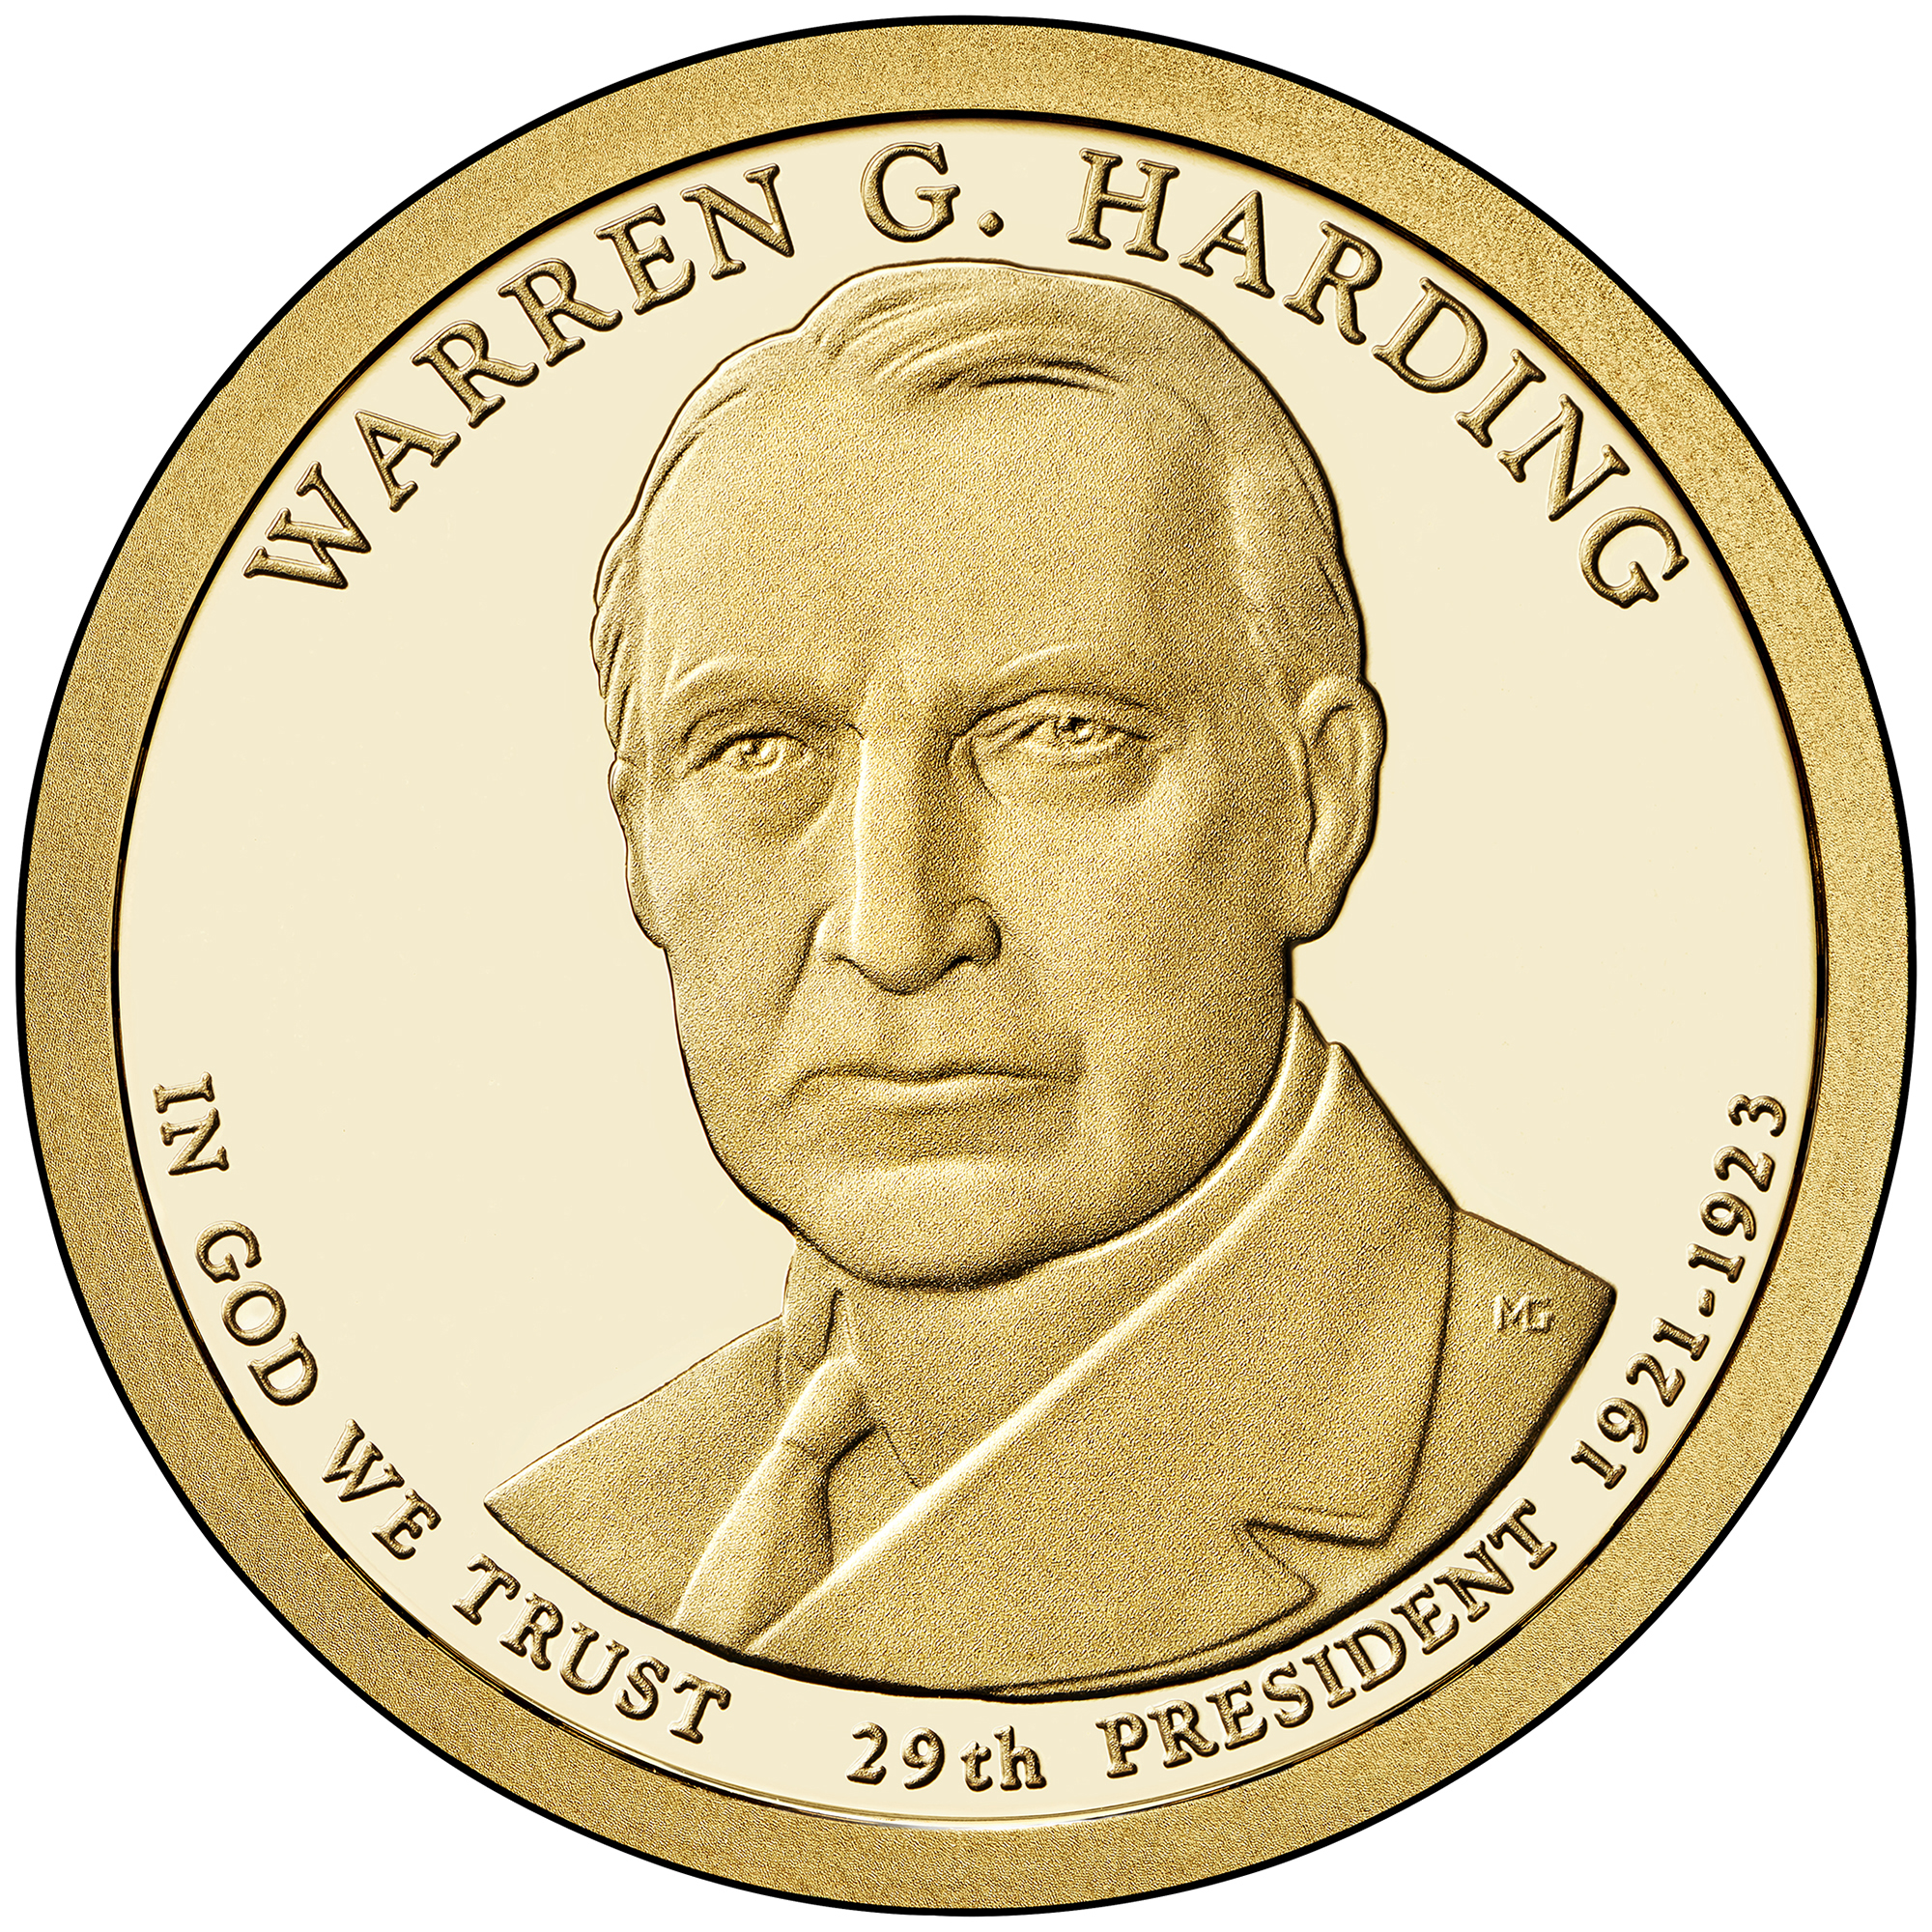 2014 Presidential Dollar Coin Warren G. Harding Proof Obverse